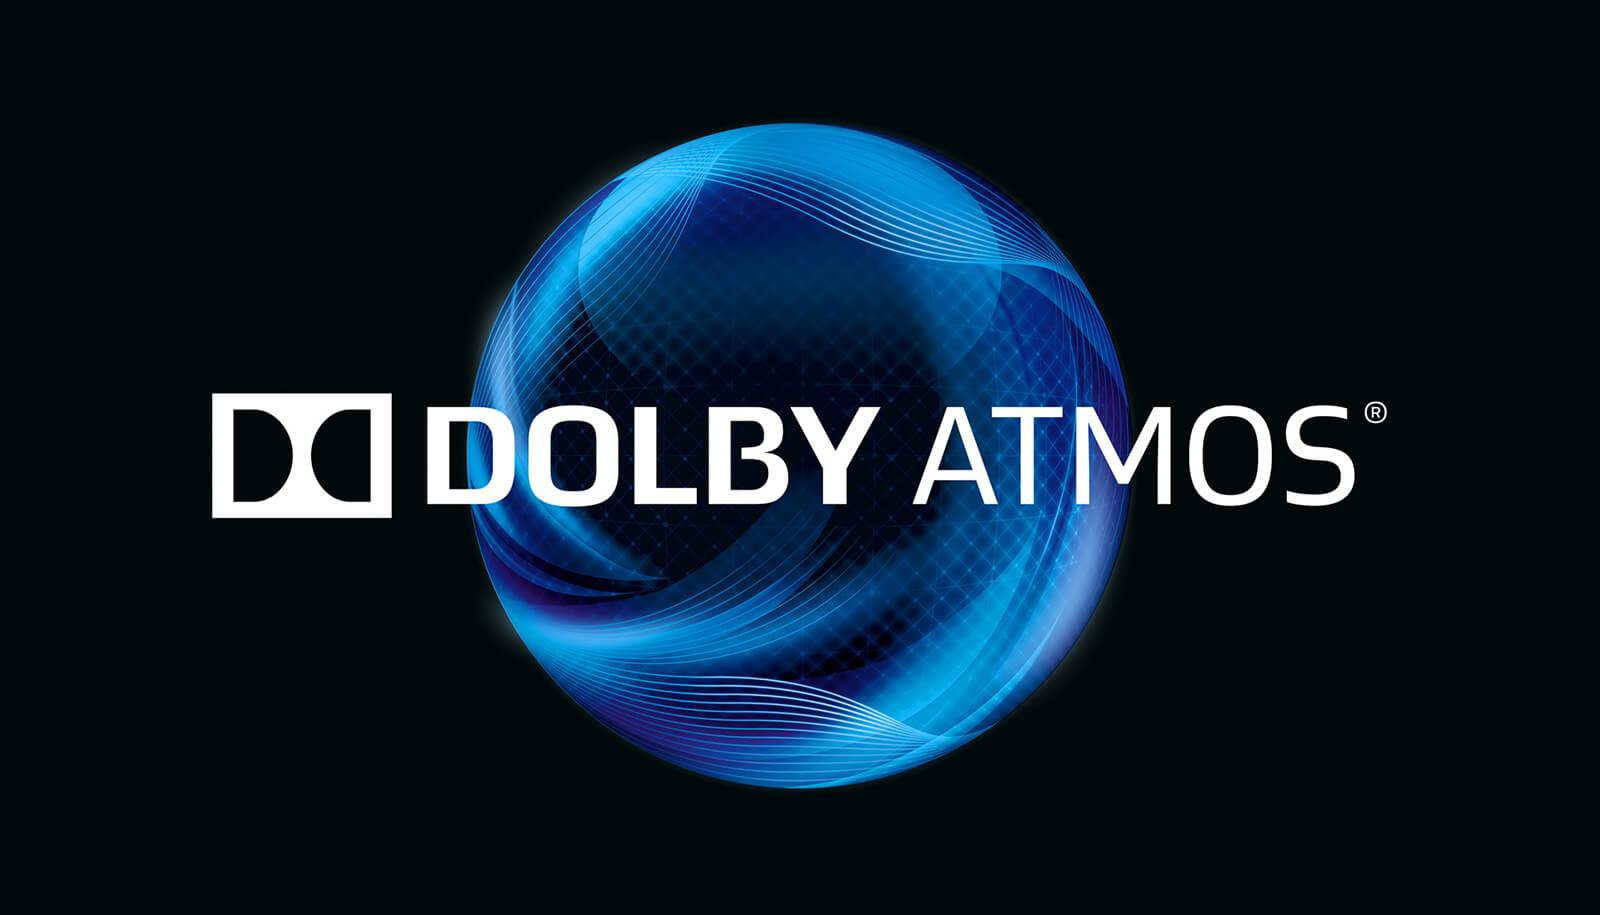 dolby digital dolby atmos packaging branding - blue